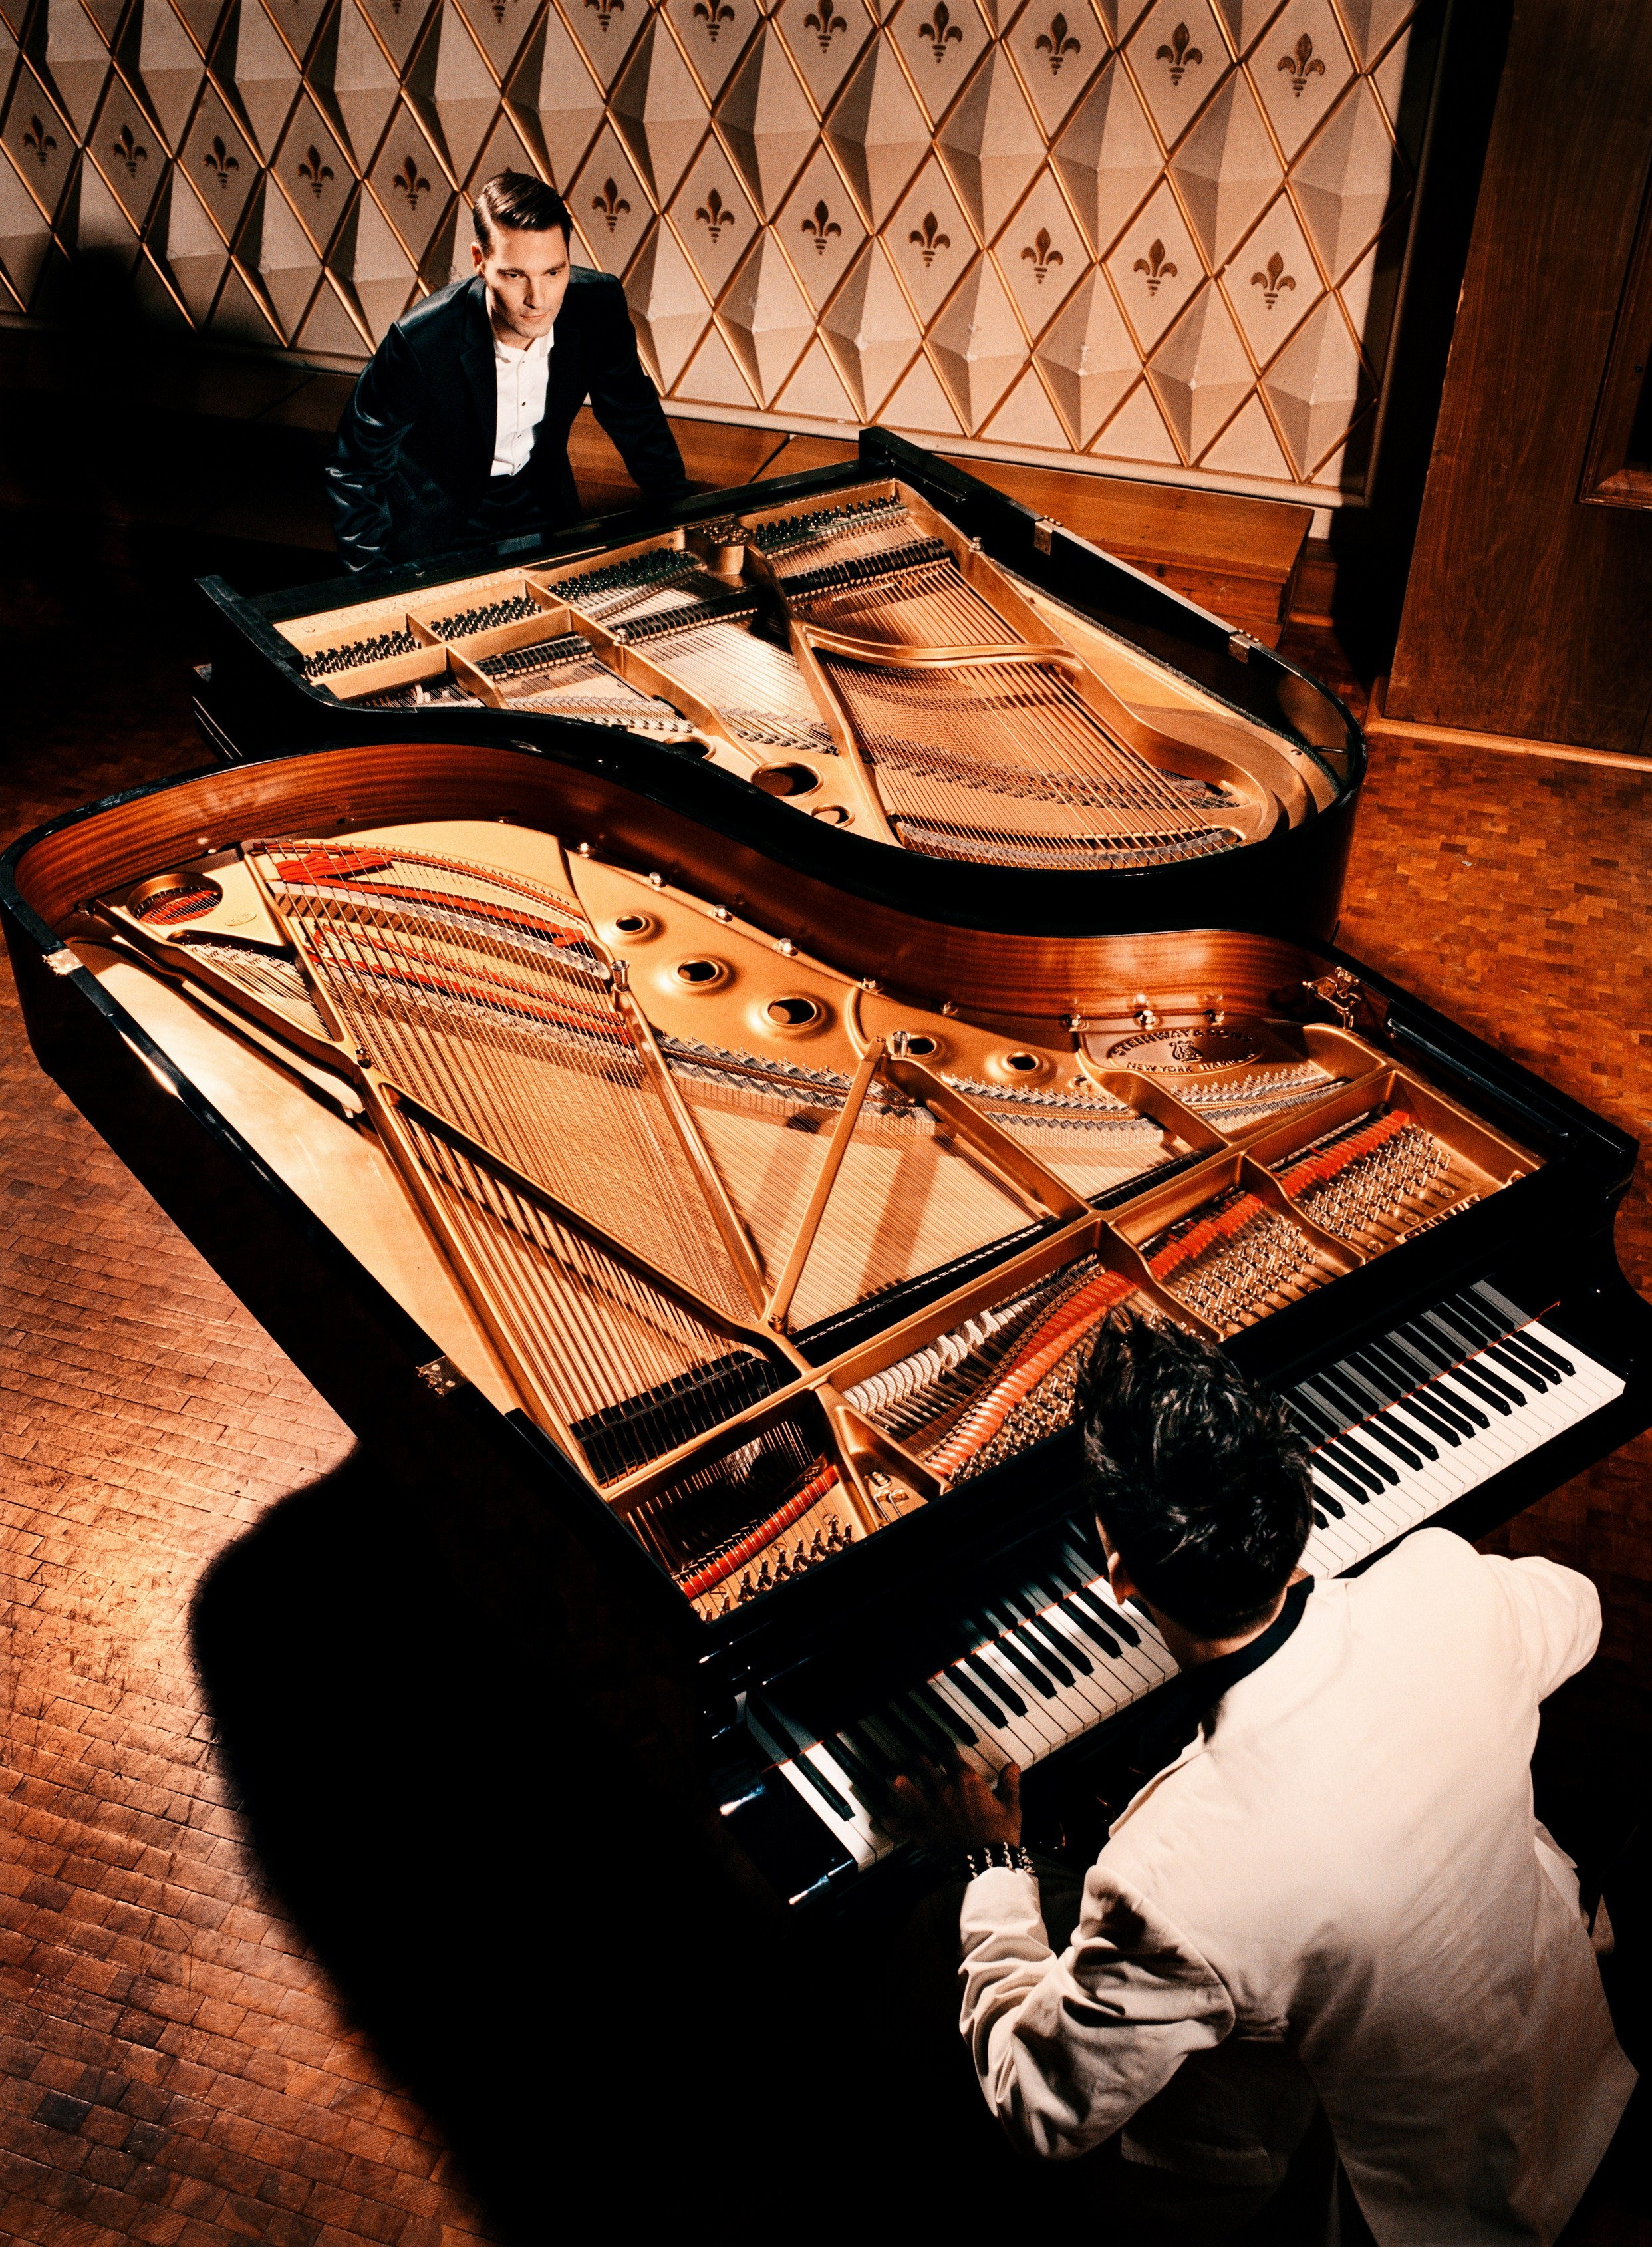 Piano Battle 2.0